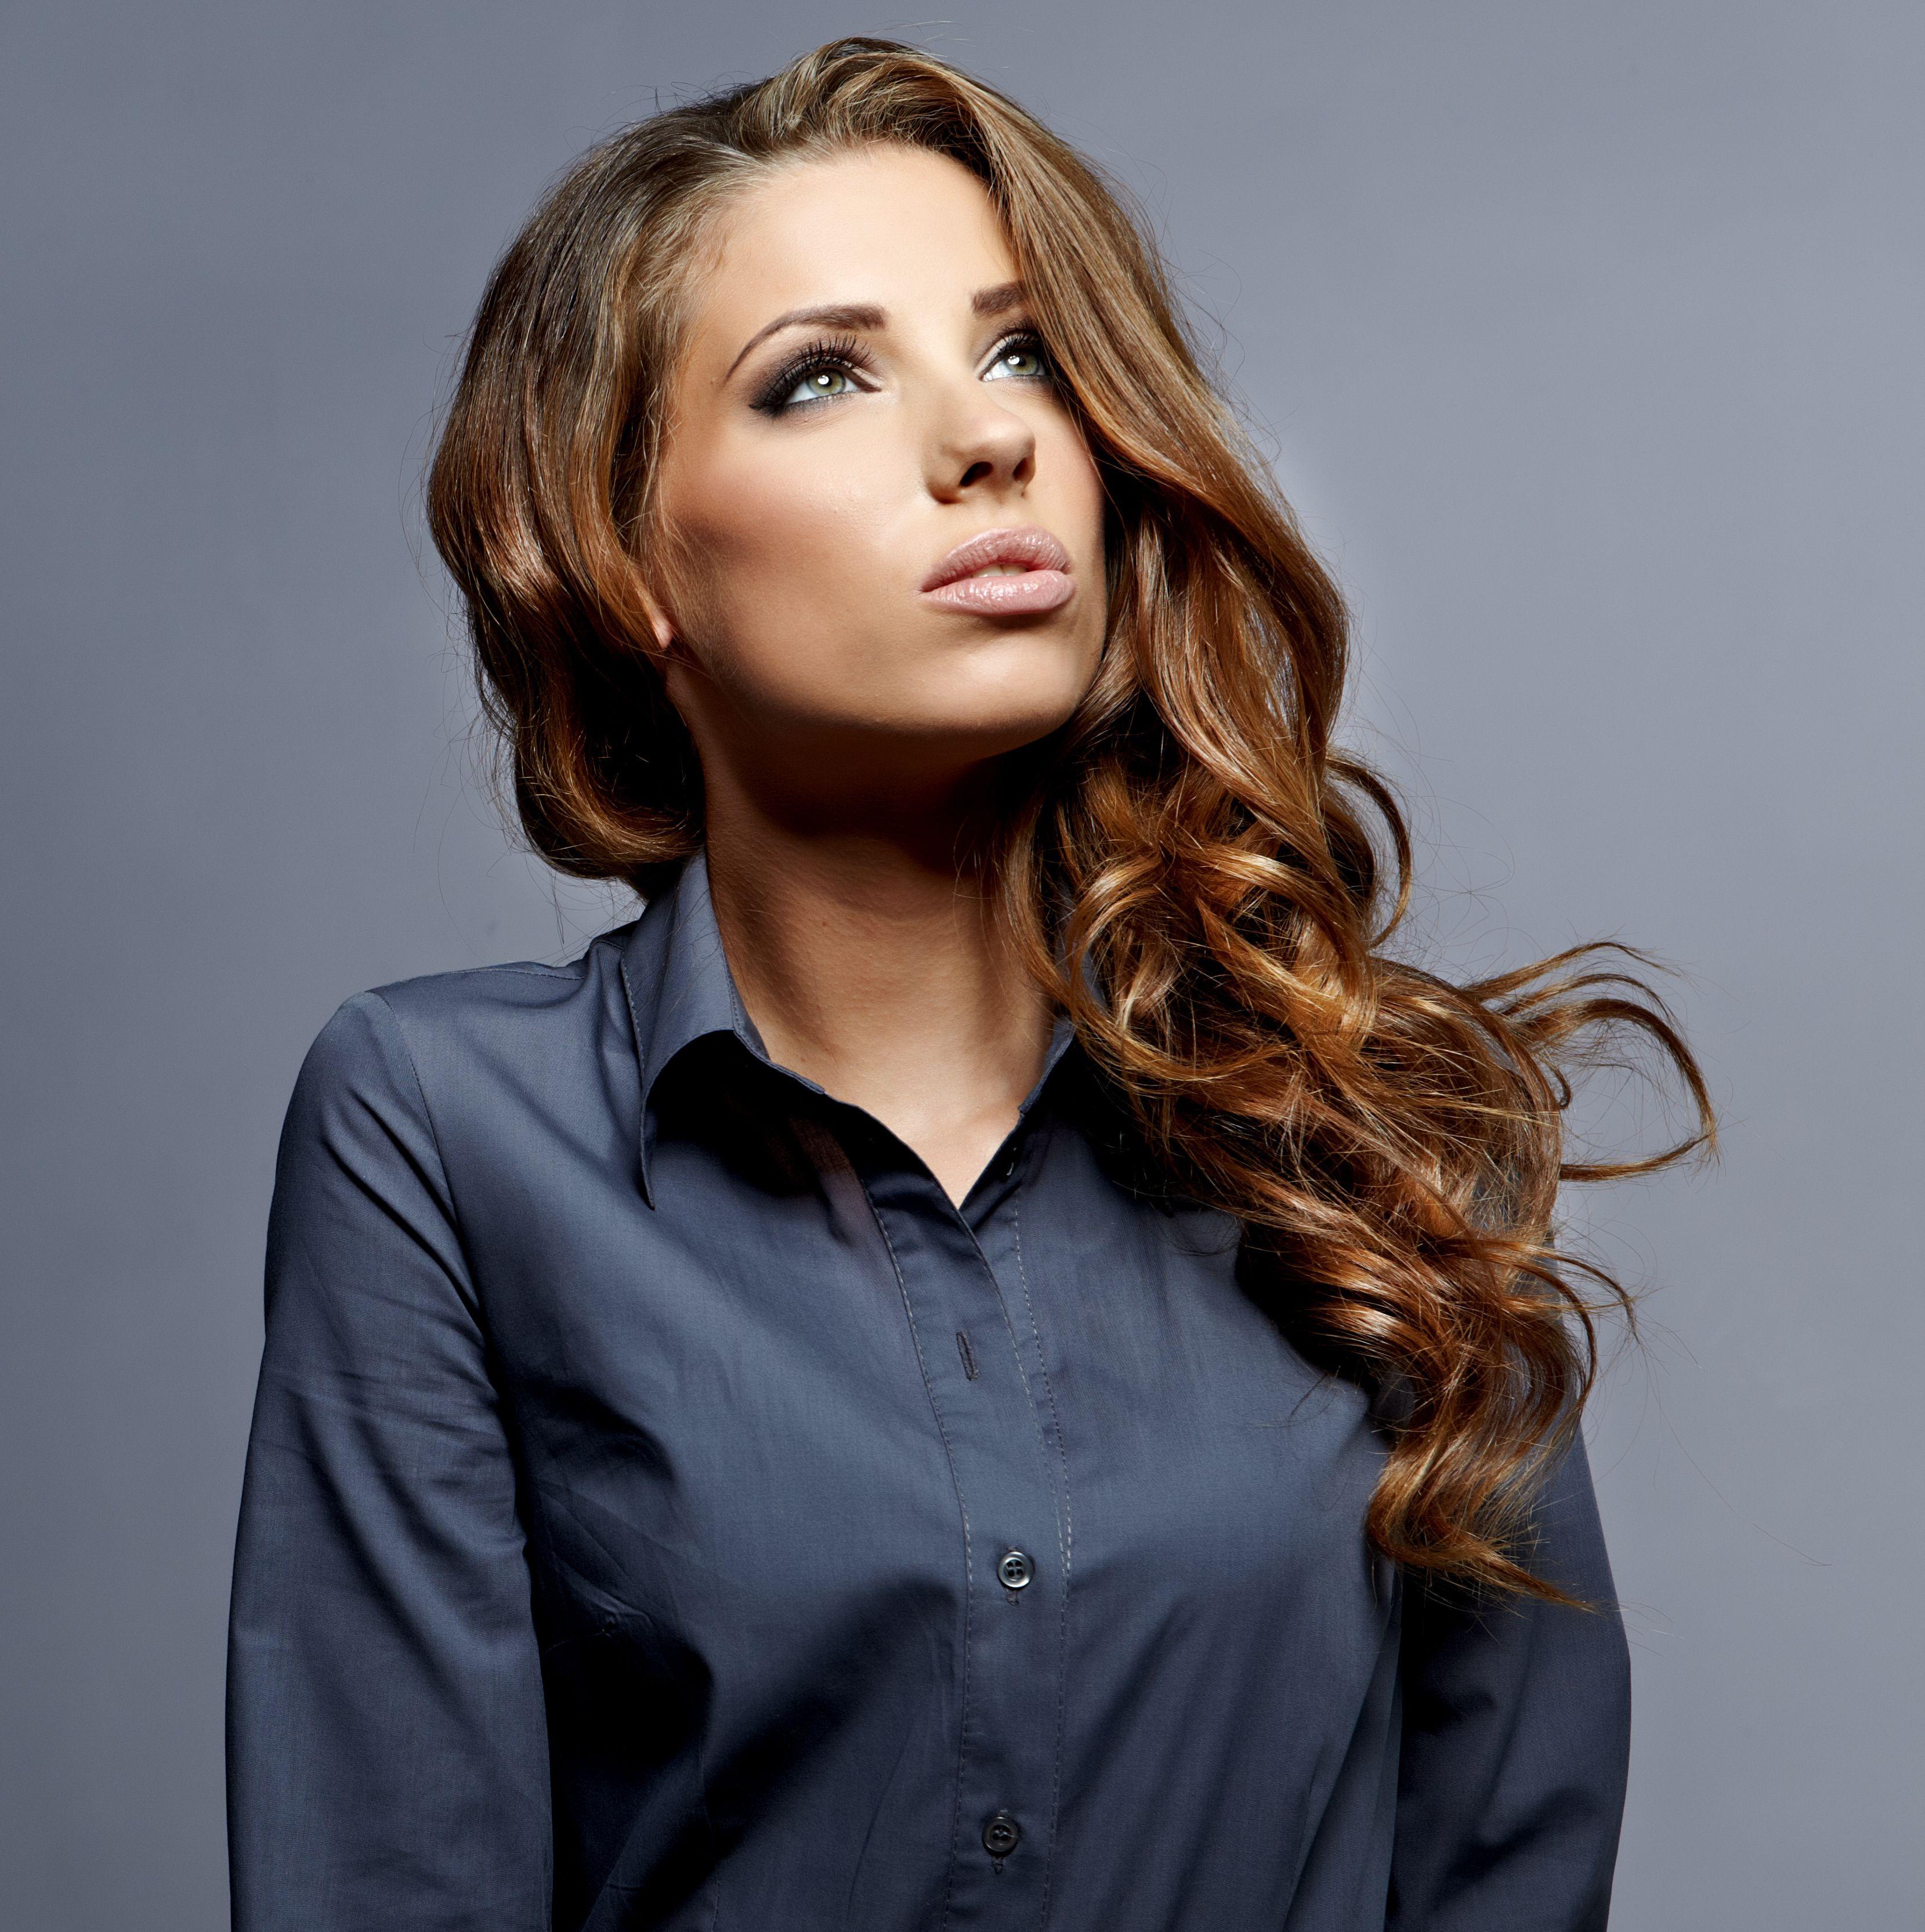 Beautiful Business Business Woman Cute Fashion Female Girl